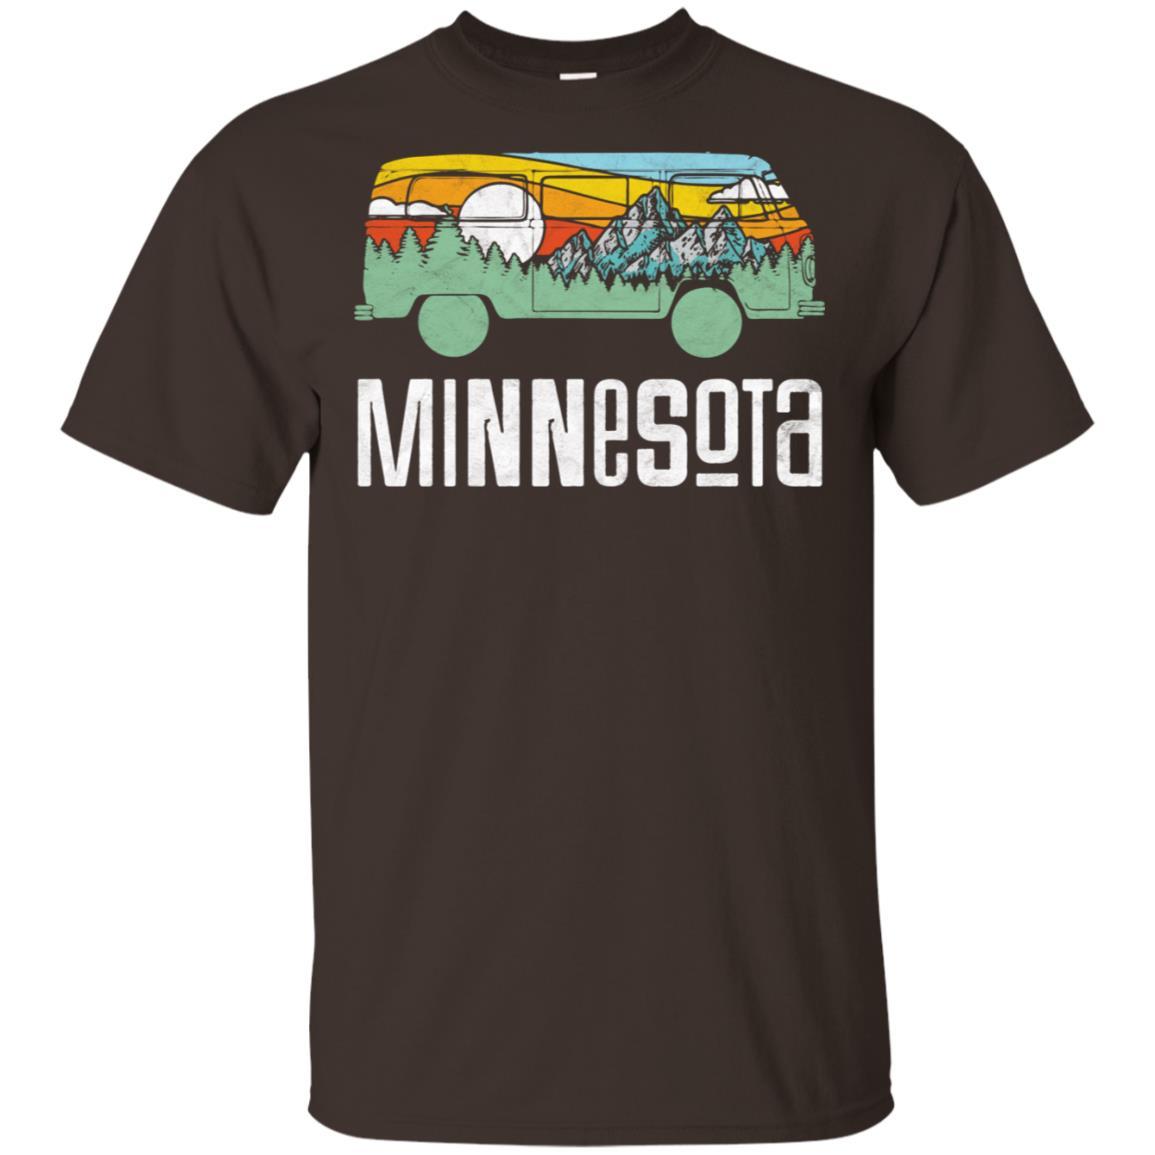 Retro Minnesota Outdoor Hippie Van Nature Tee Unisex Short Sleeve